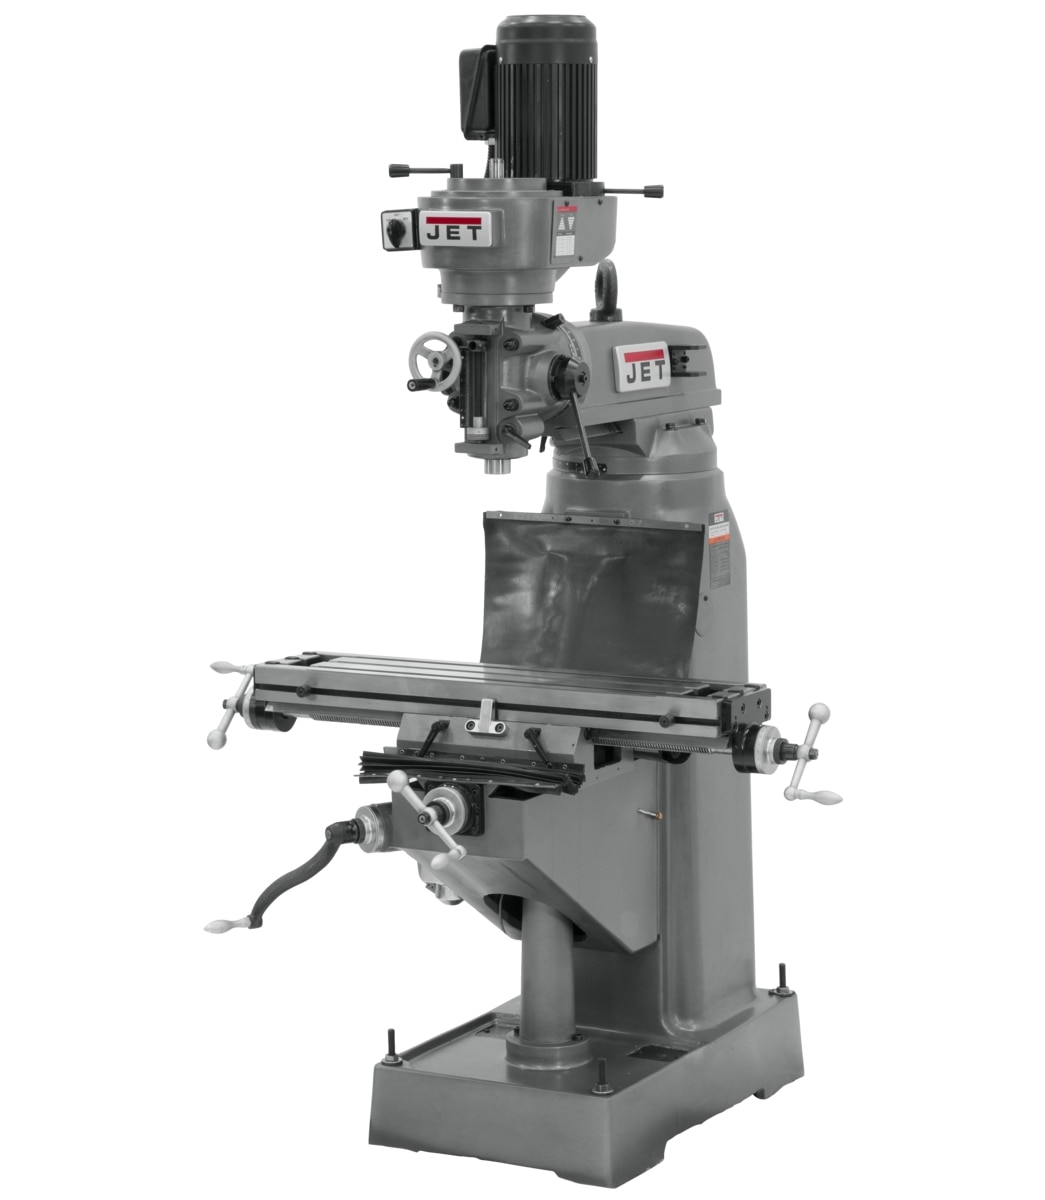 JVM-836-3 Step Pulley Milling Machine 230V 3Ph